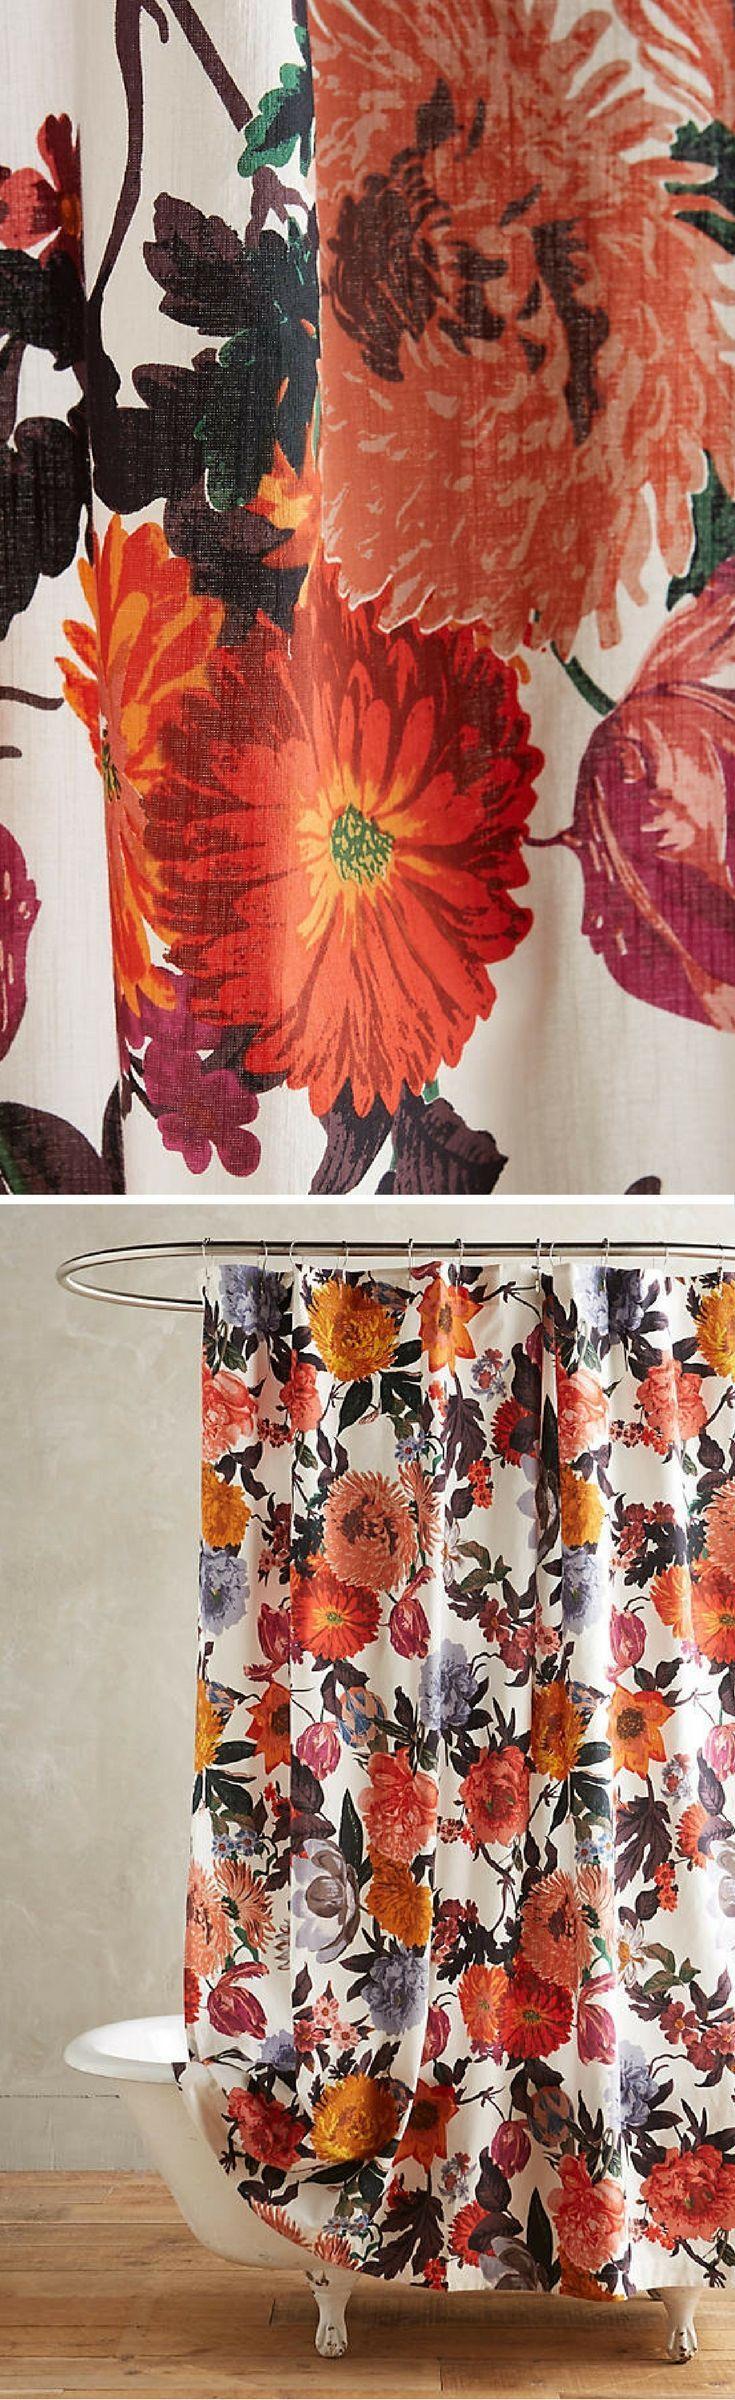 Floral Shower Curtain | Retro | Bathroom Decor | Ad #homedecor #bathroom